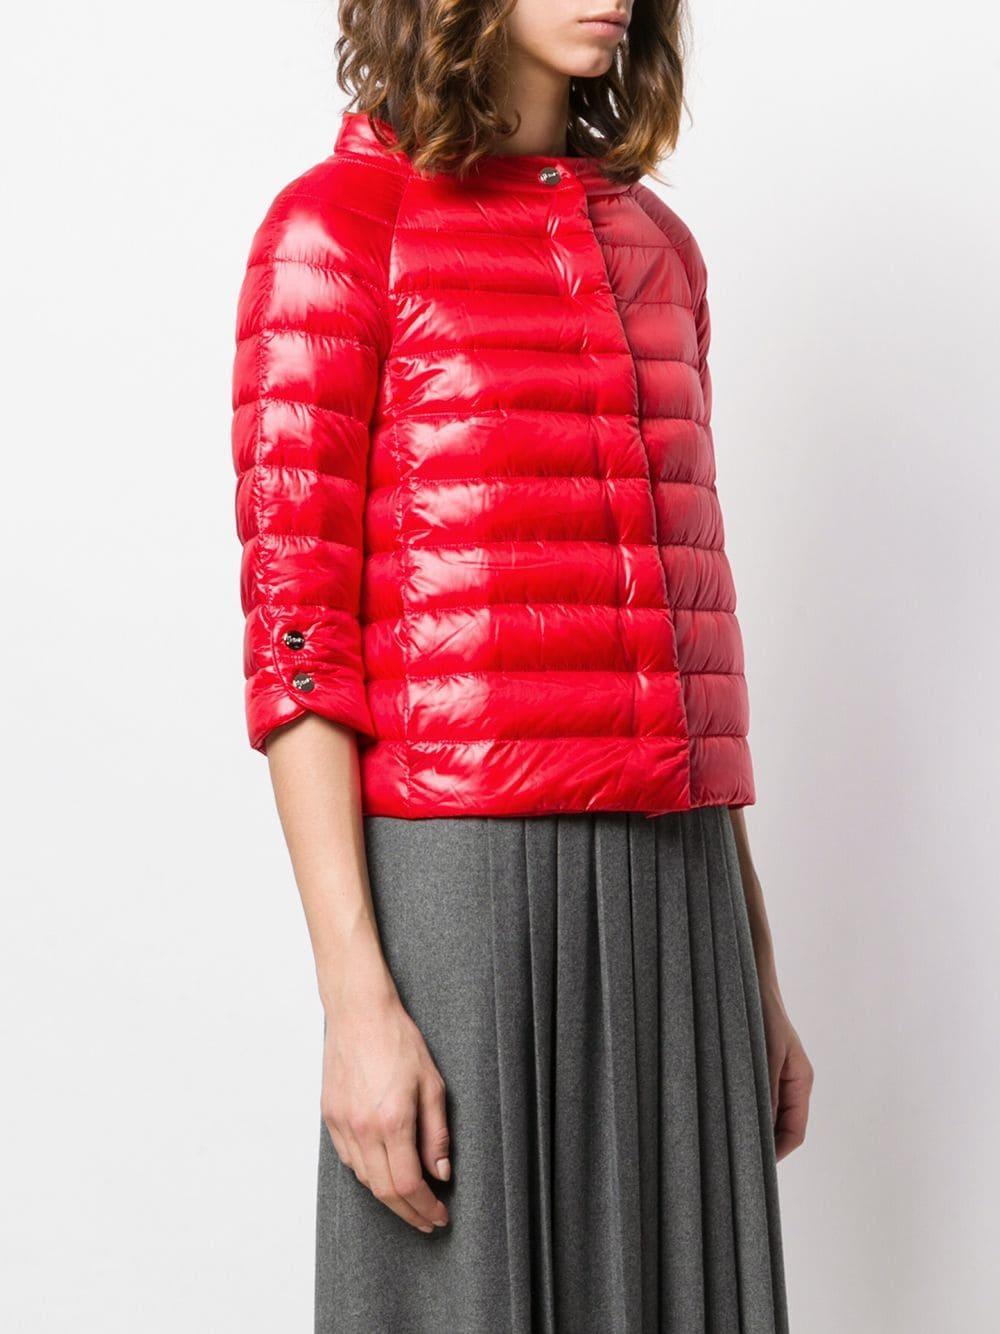 5b4e0ce546a Herno - Red Short Puffer Jacket - Lyst. View fullscreen